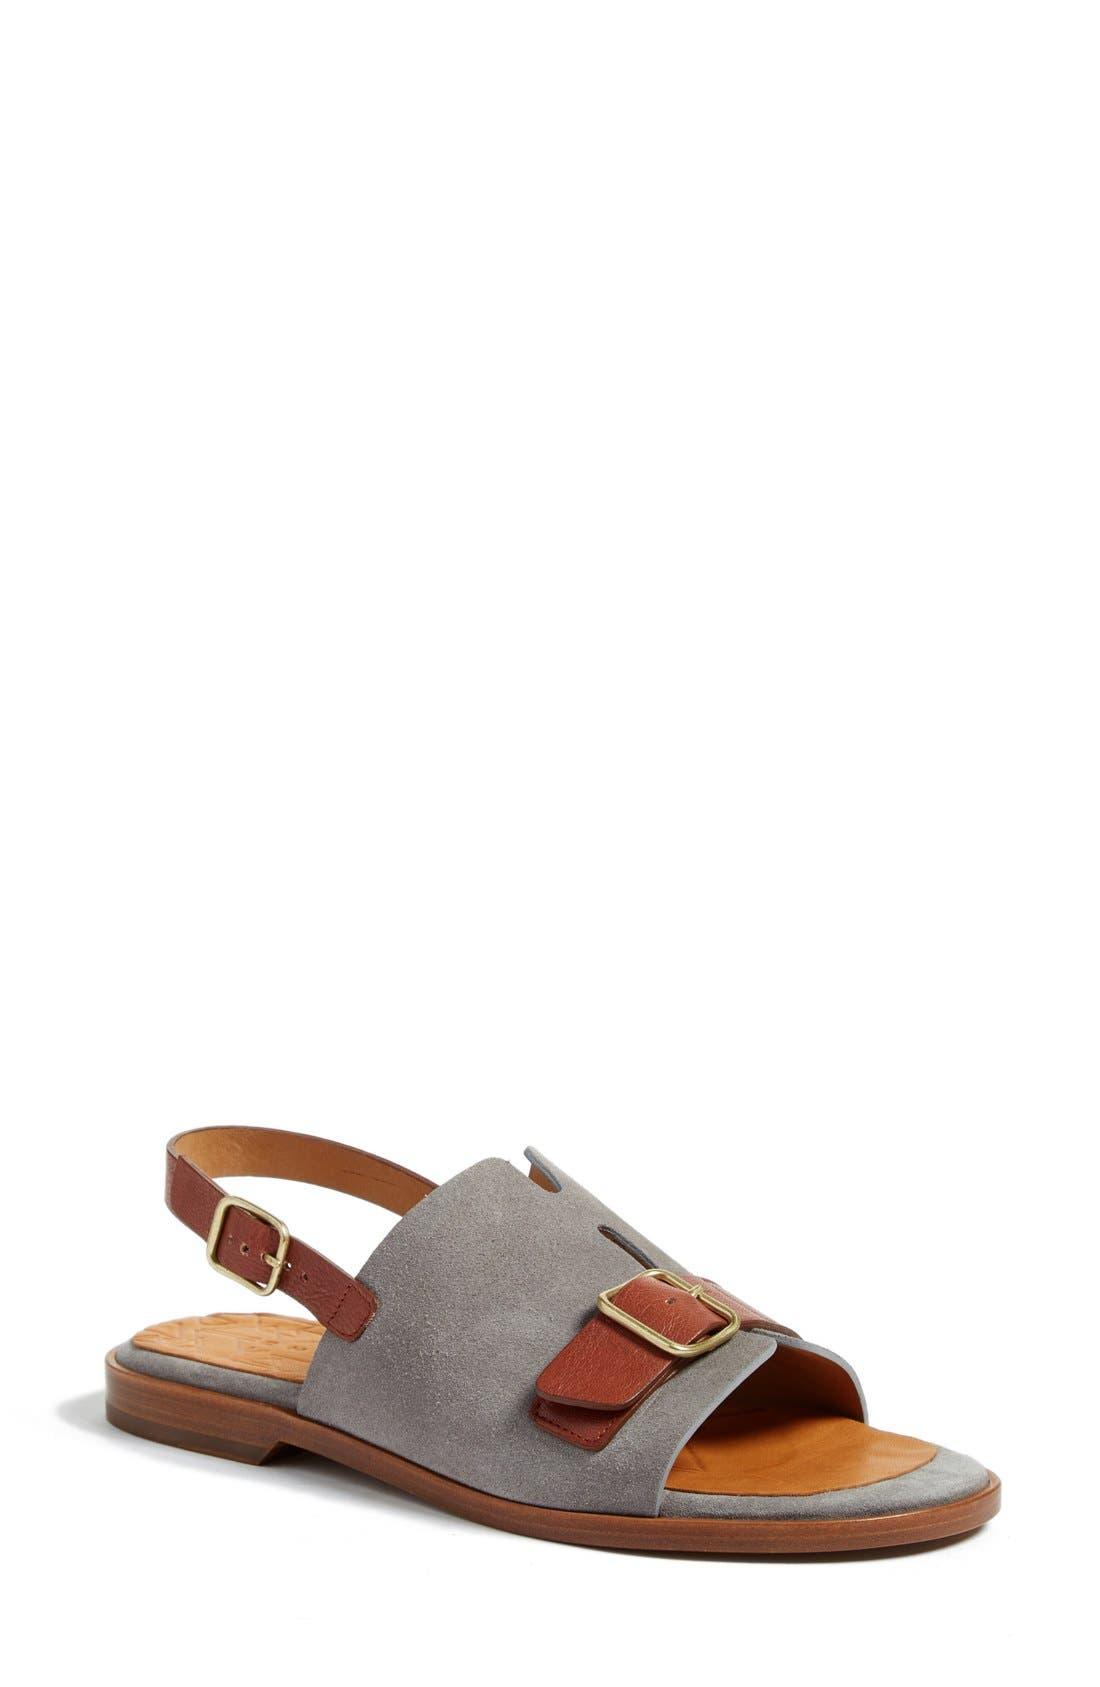 Querete Slingback Sandal,                             Main thumbnail 1, color,                             Stone/ Brown